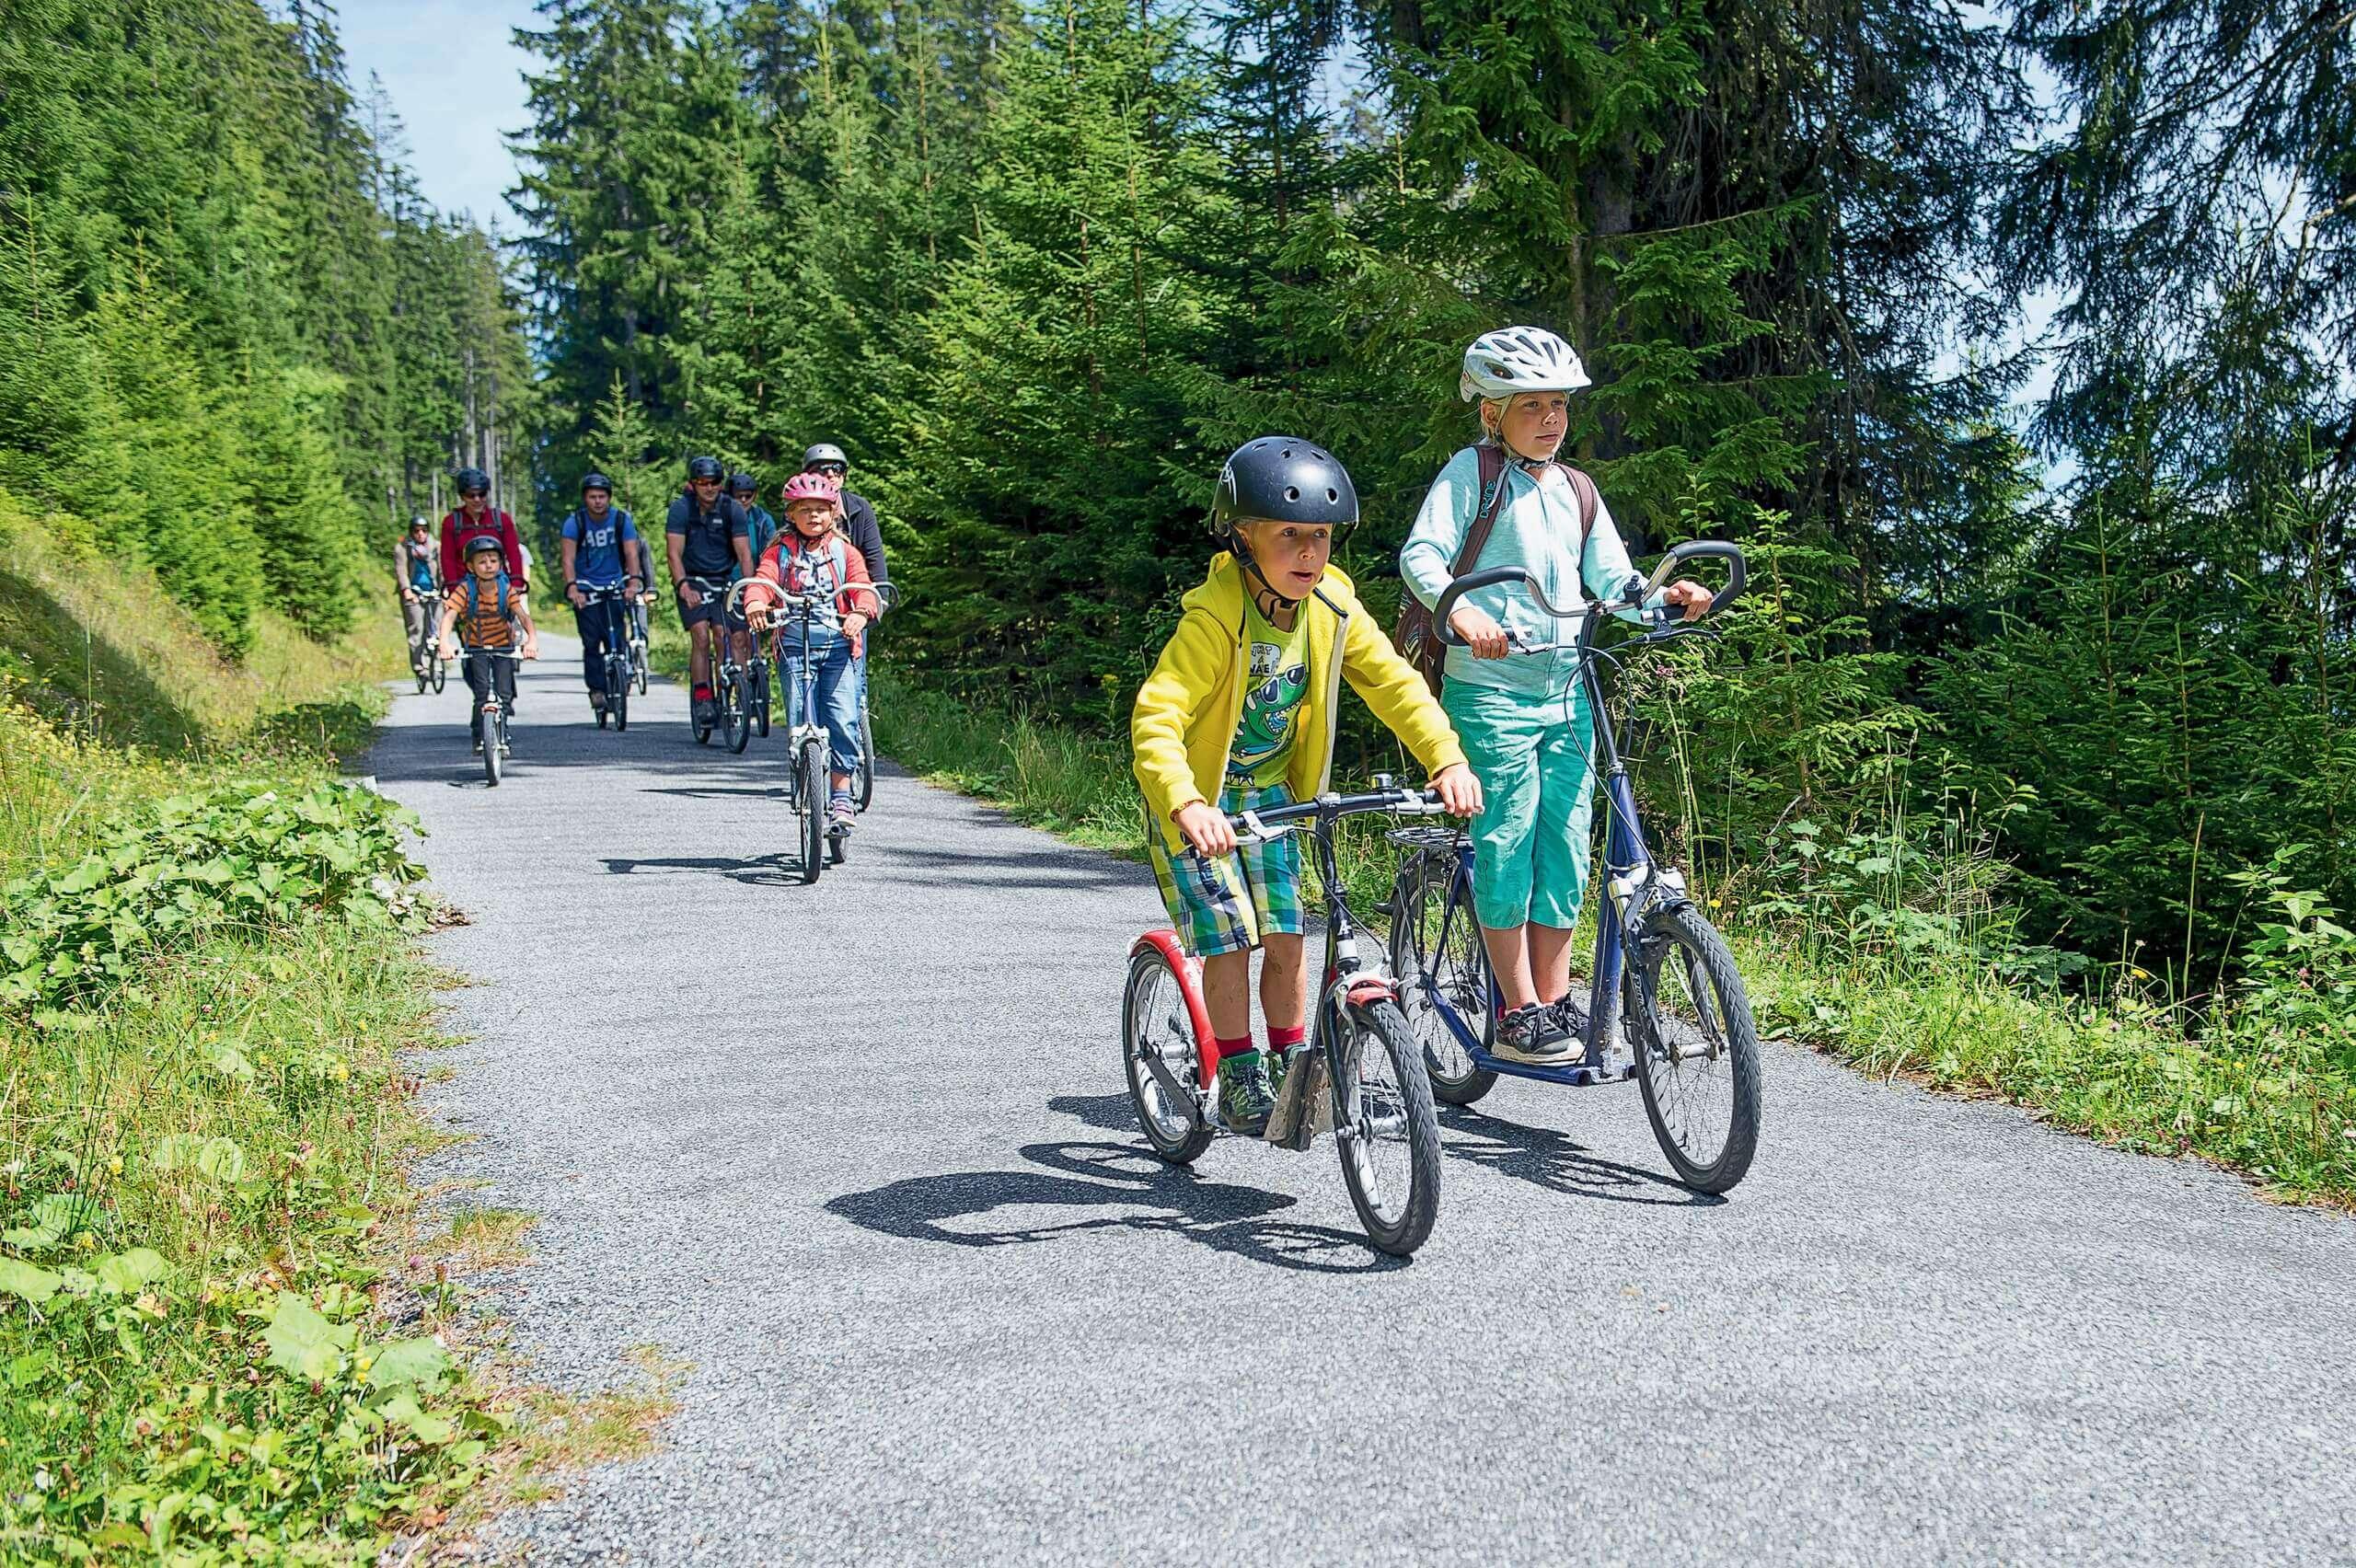 niederhorn-trotti-bike-sommer-abfahrt-gruppe-familie-spass